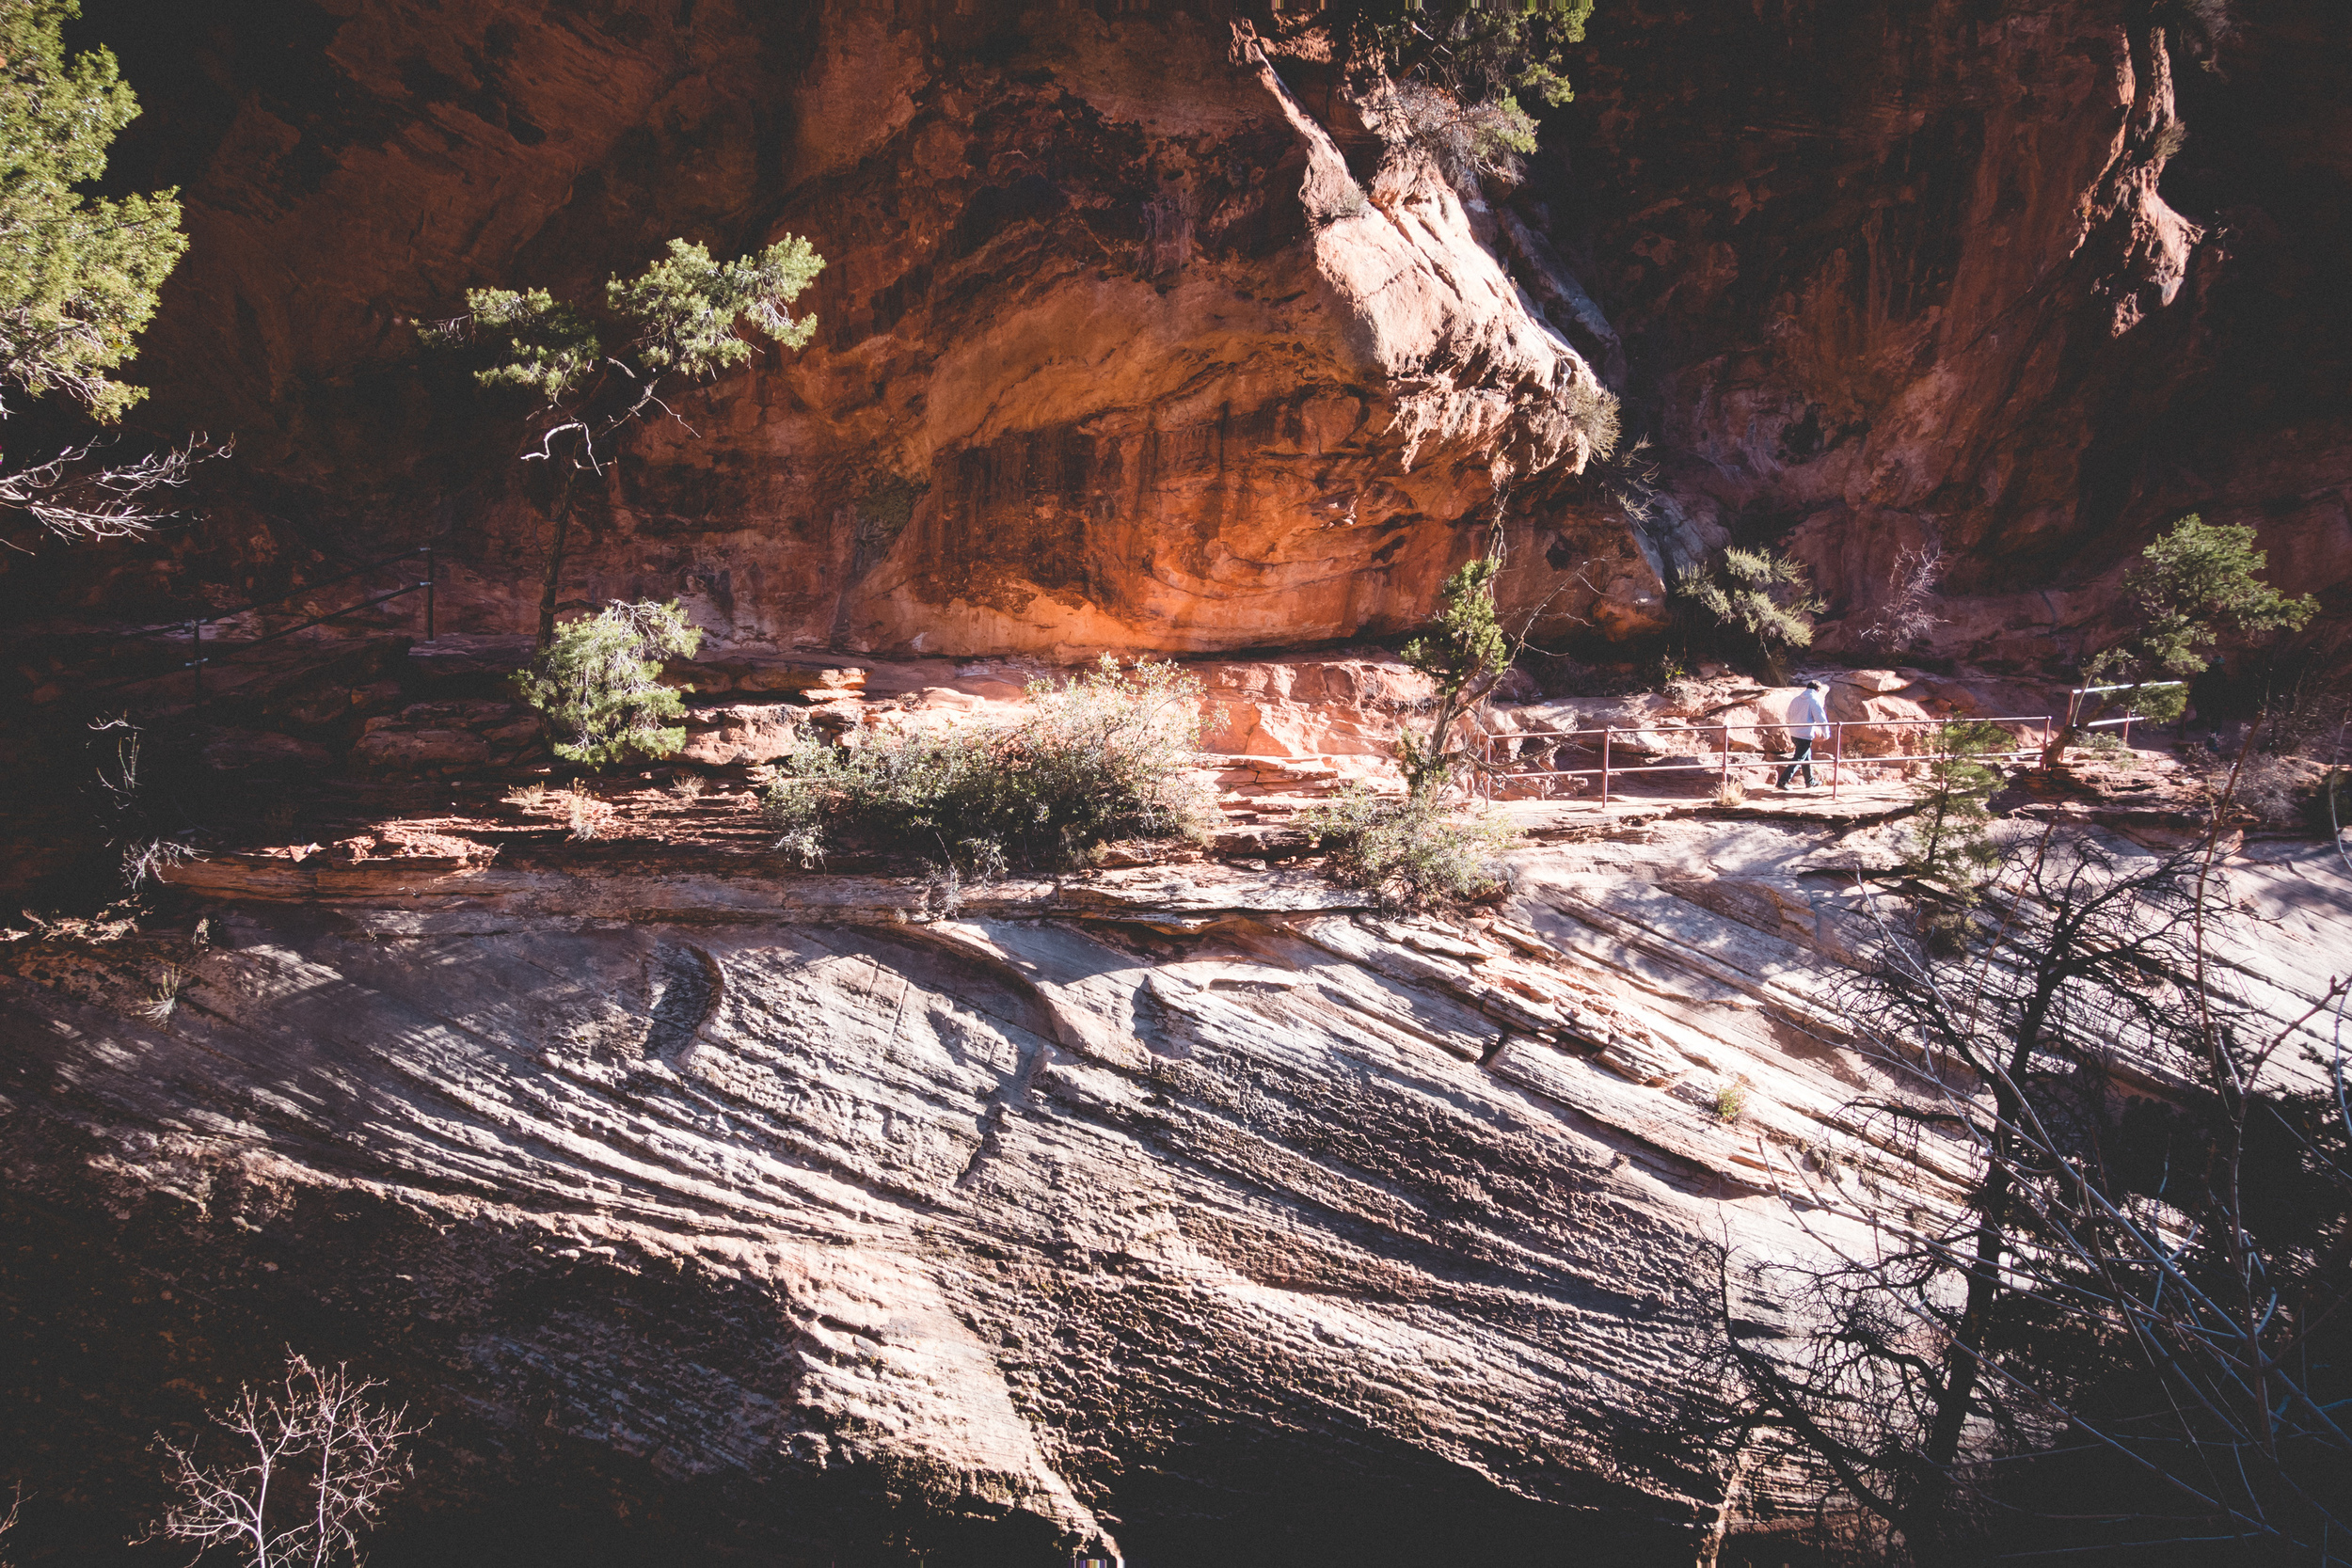 Zion-National-Park-4.jpg